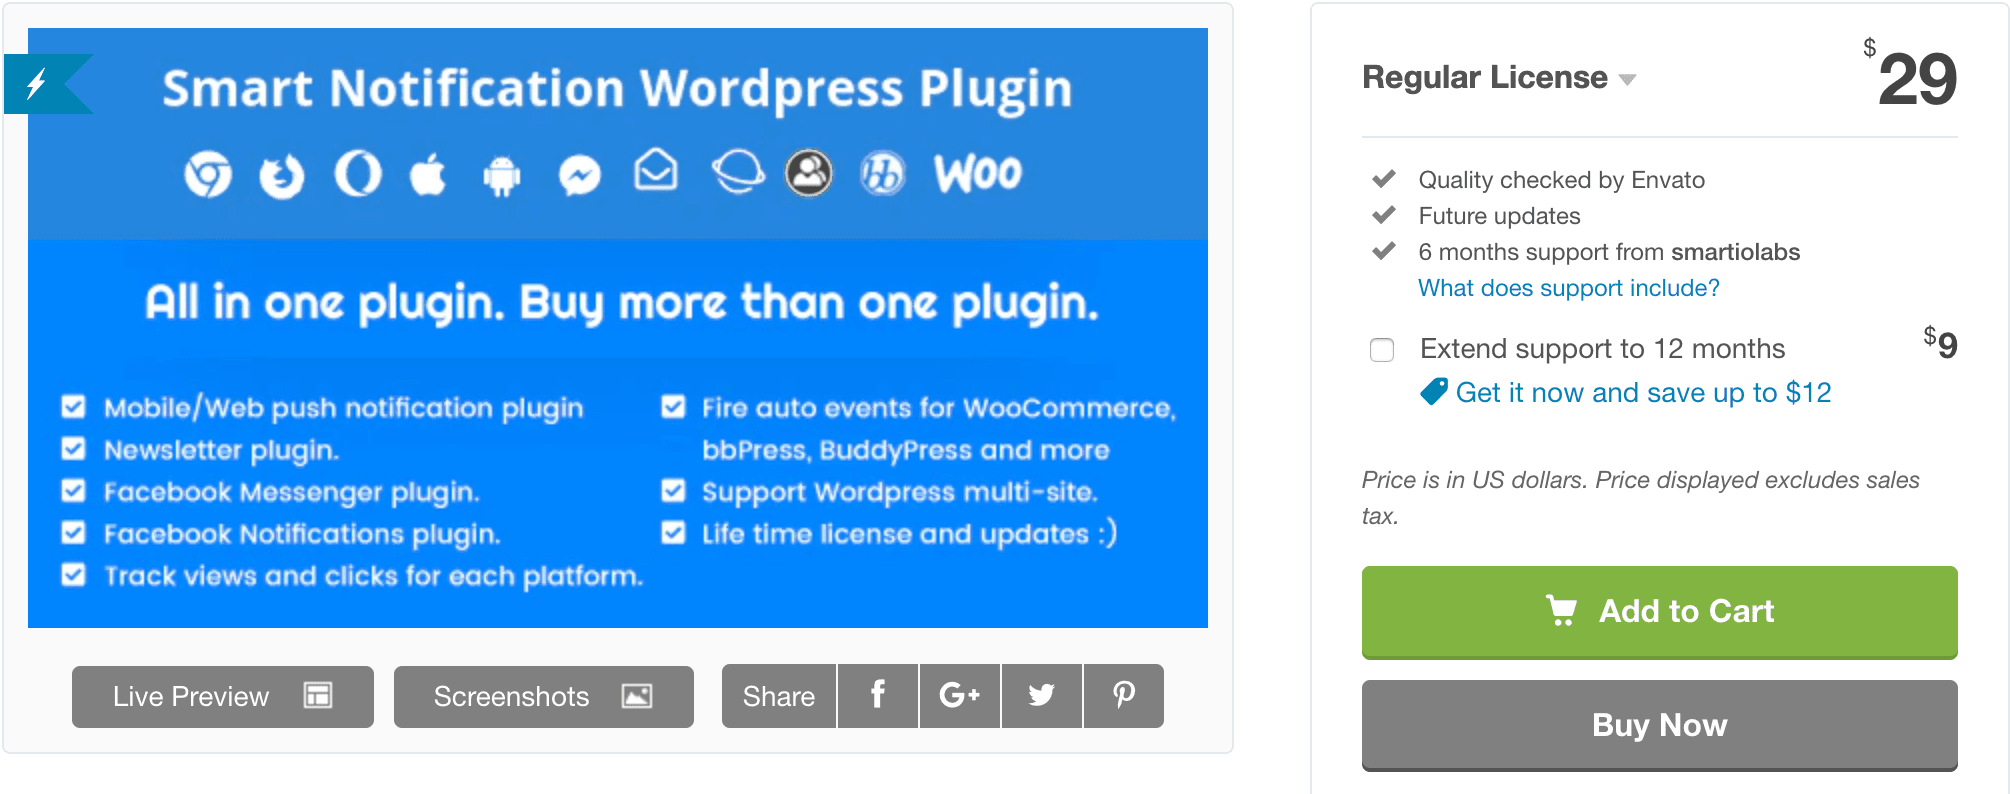 The Smart Notification WordPress Plugin.